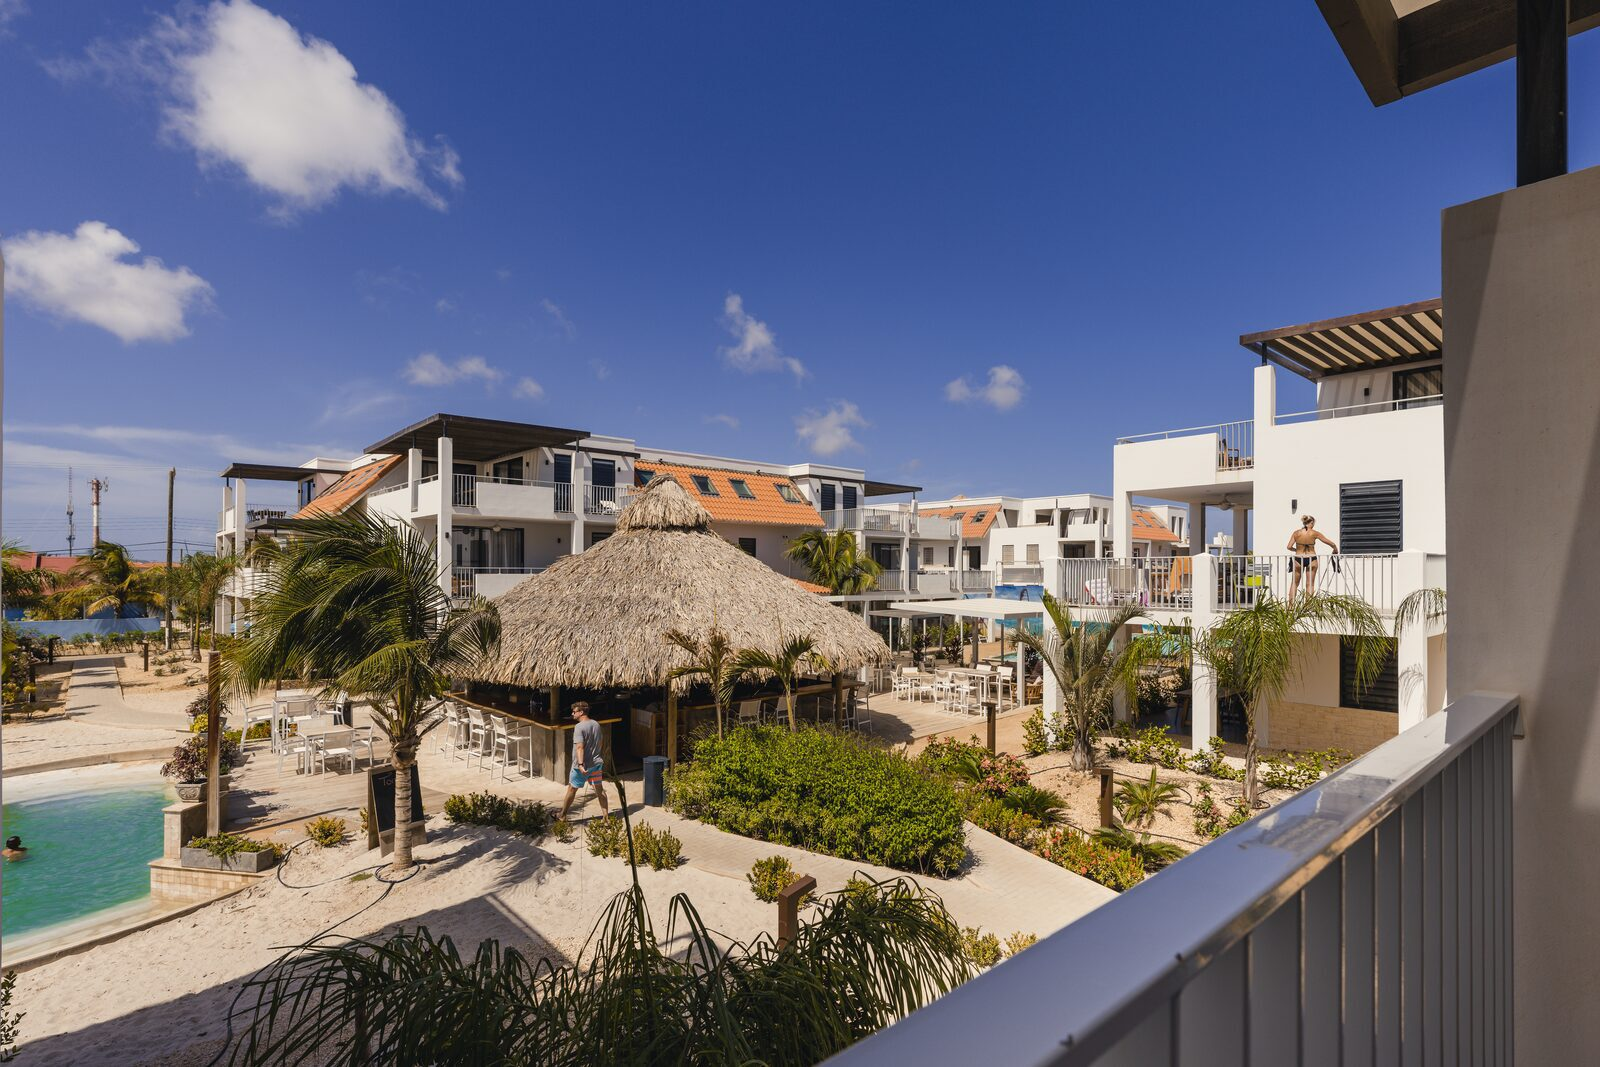 Luxury resort at Bonaire